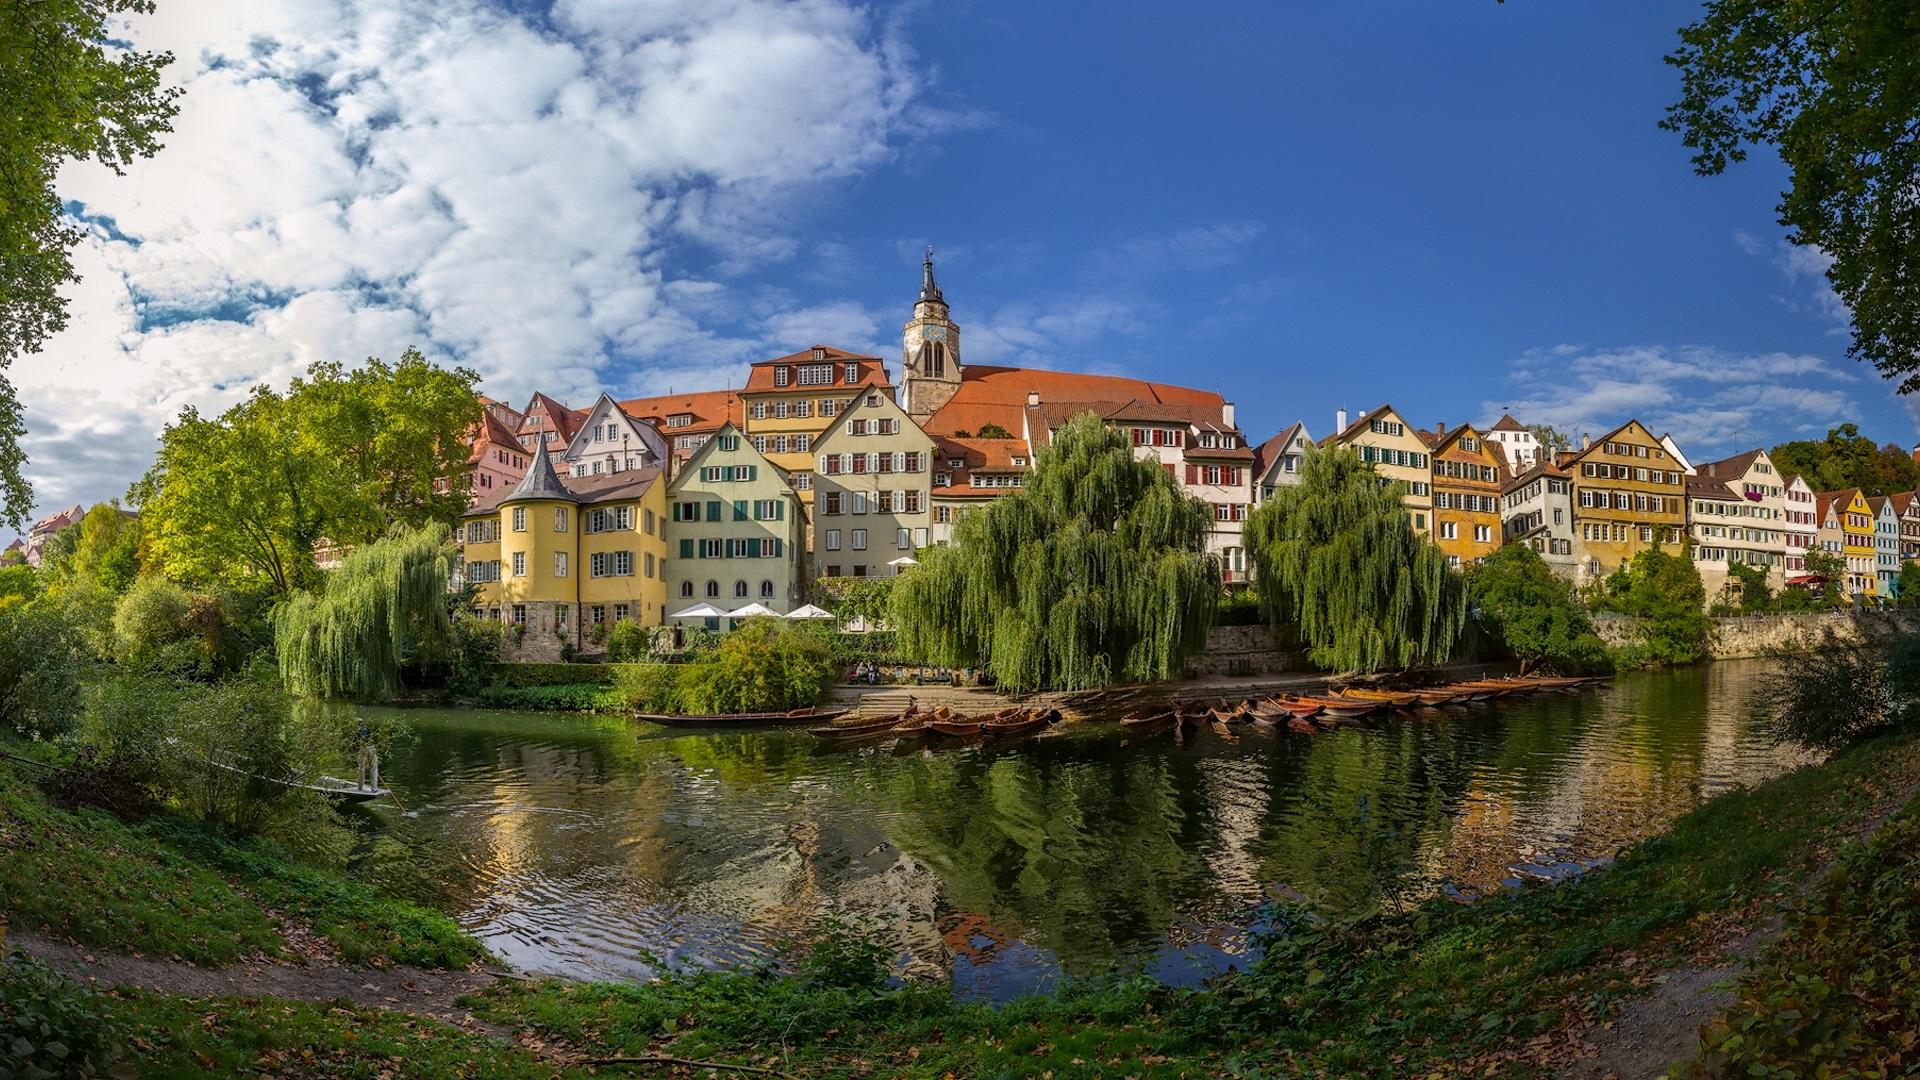 Wallpaper Germany, Baden-Wurttemberg, River, Boats, Trees